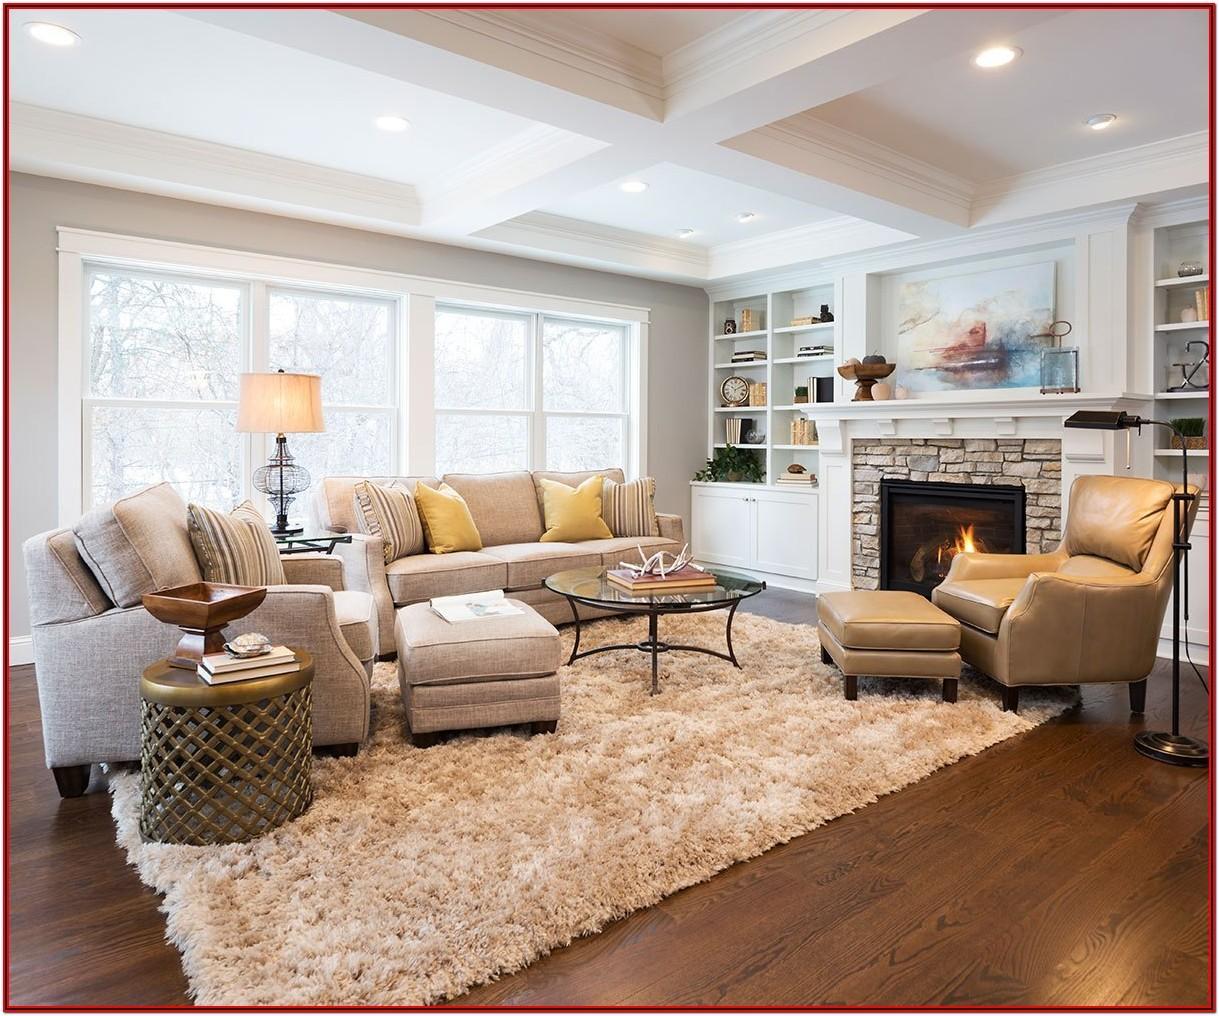 Help Arranging Furniture In Living Room